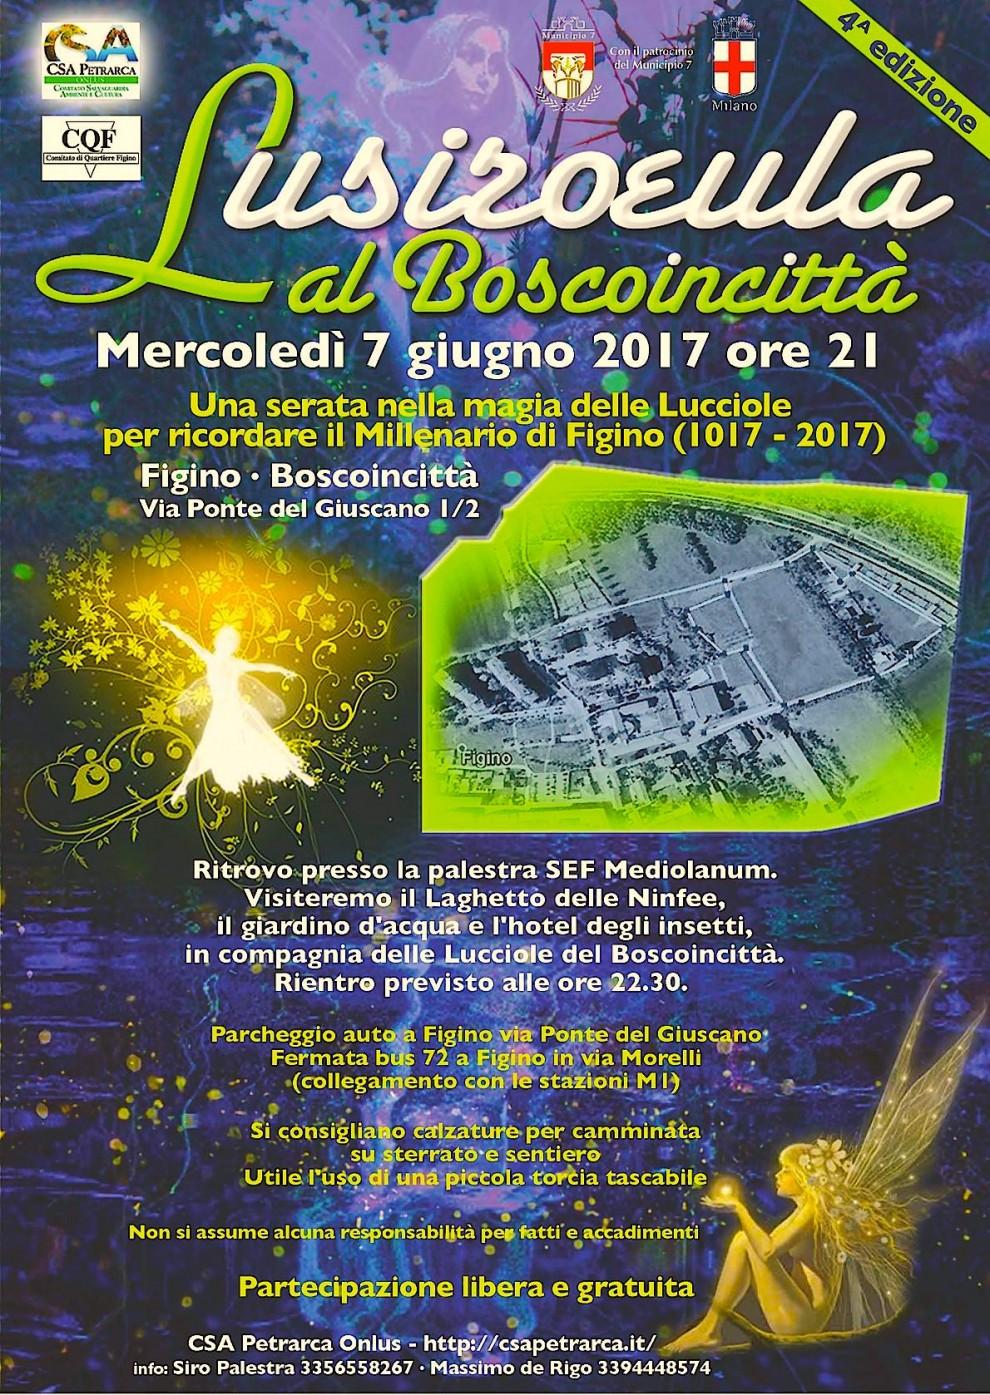 Poster Lusiroeula Boscoincittà (2017)